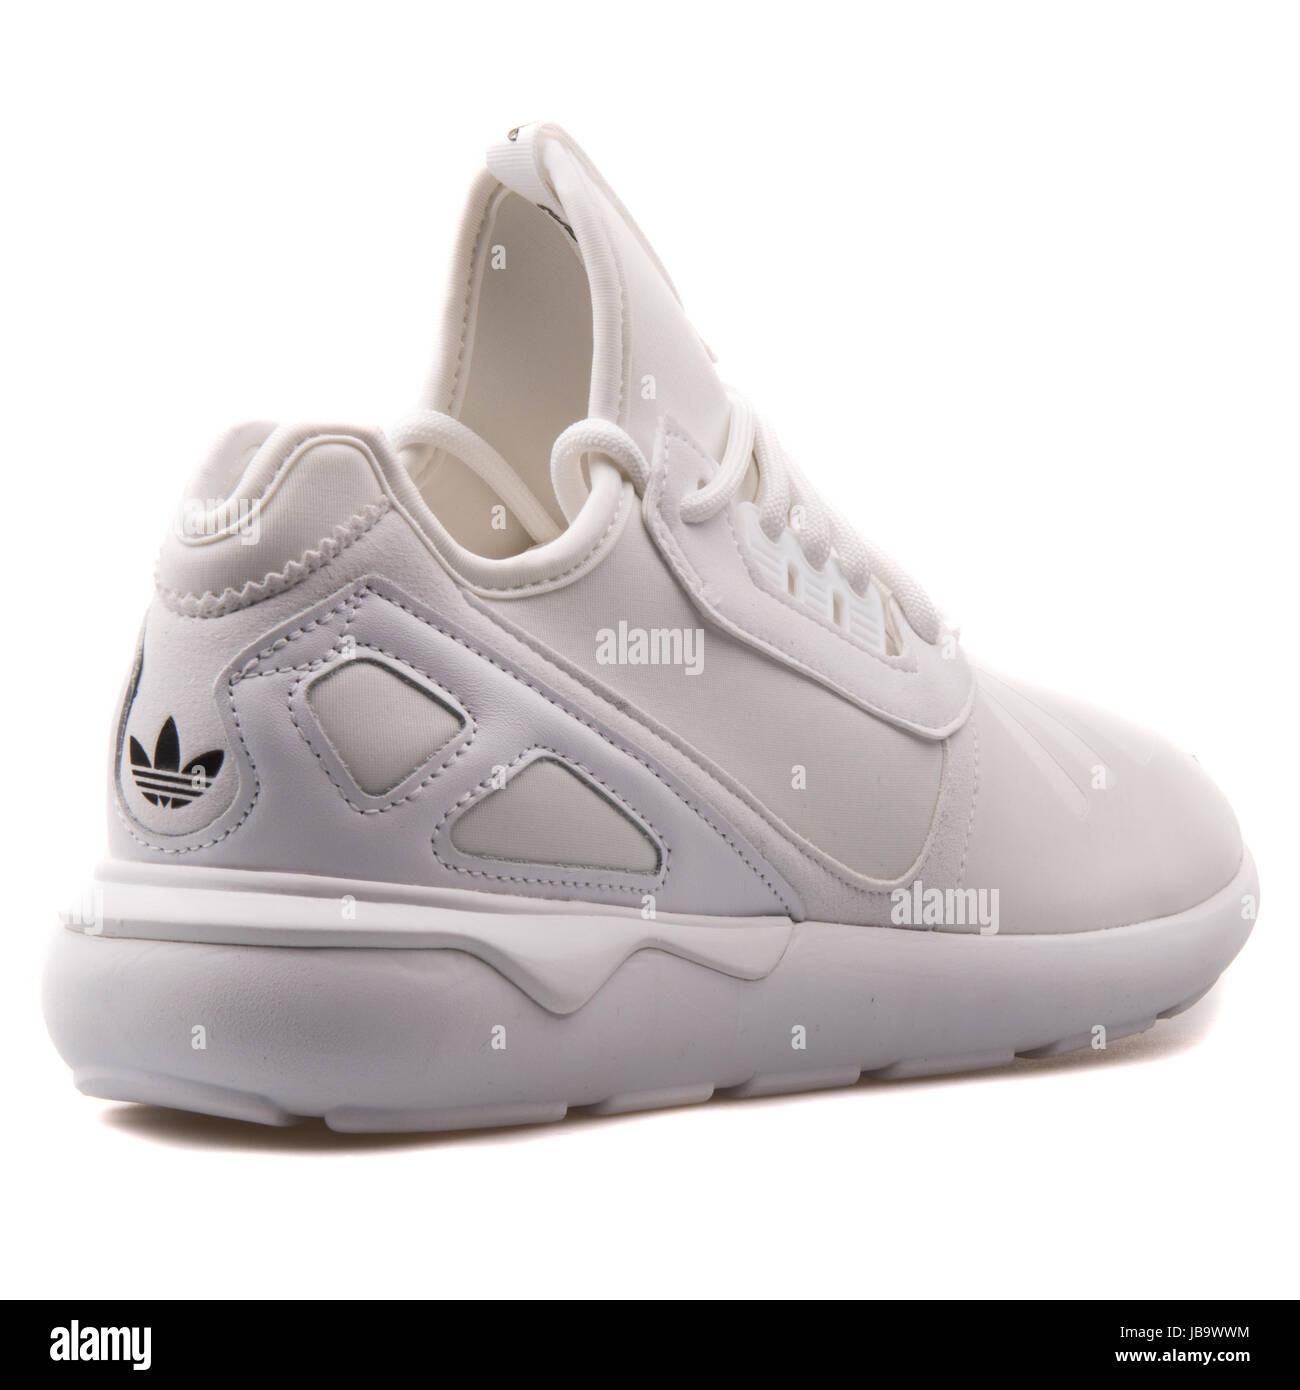 official photos d9088 f310d Adidas Tubular Runner White Men's Running Shoes - S83141 ...